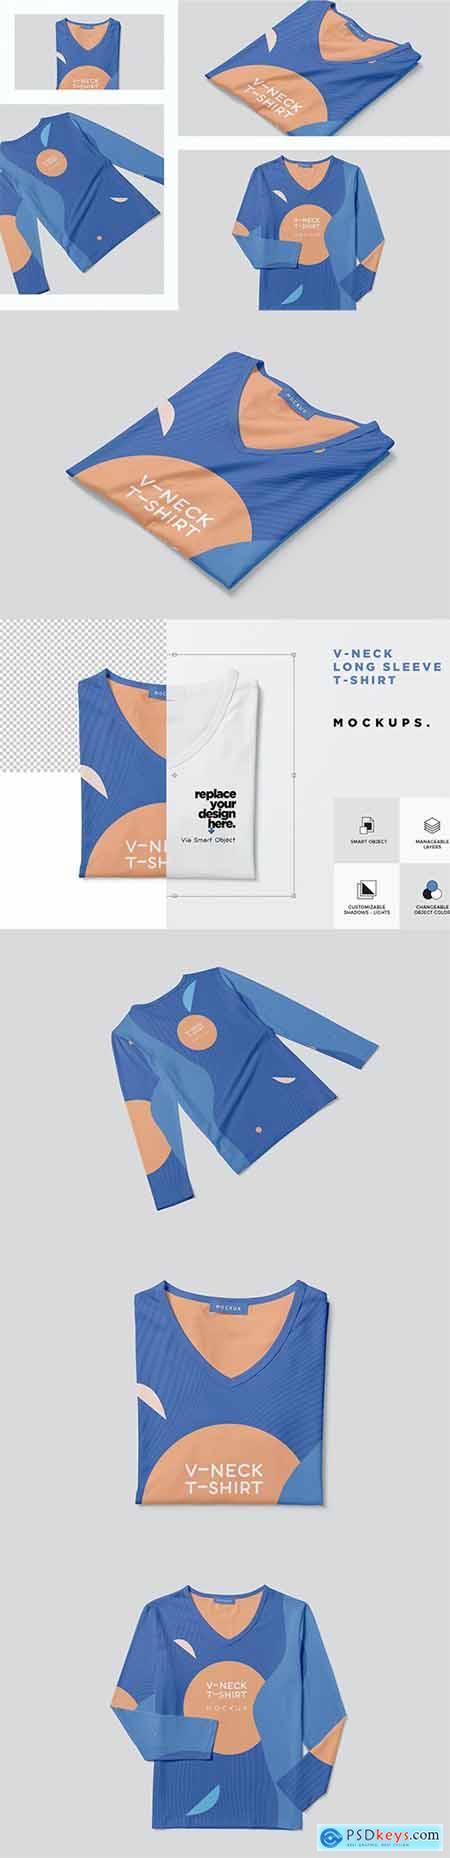 Long Sleeve V Neck T-shirt Mockups